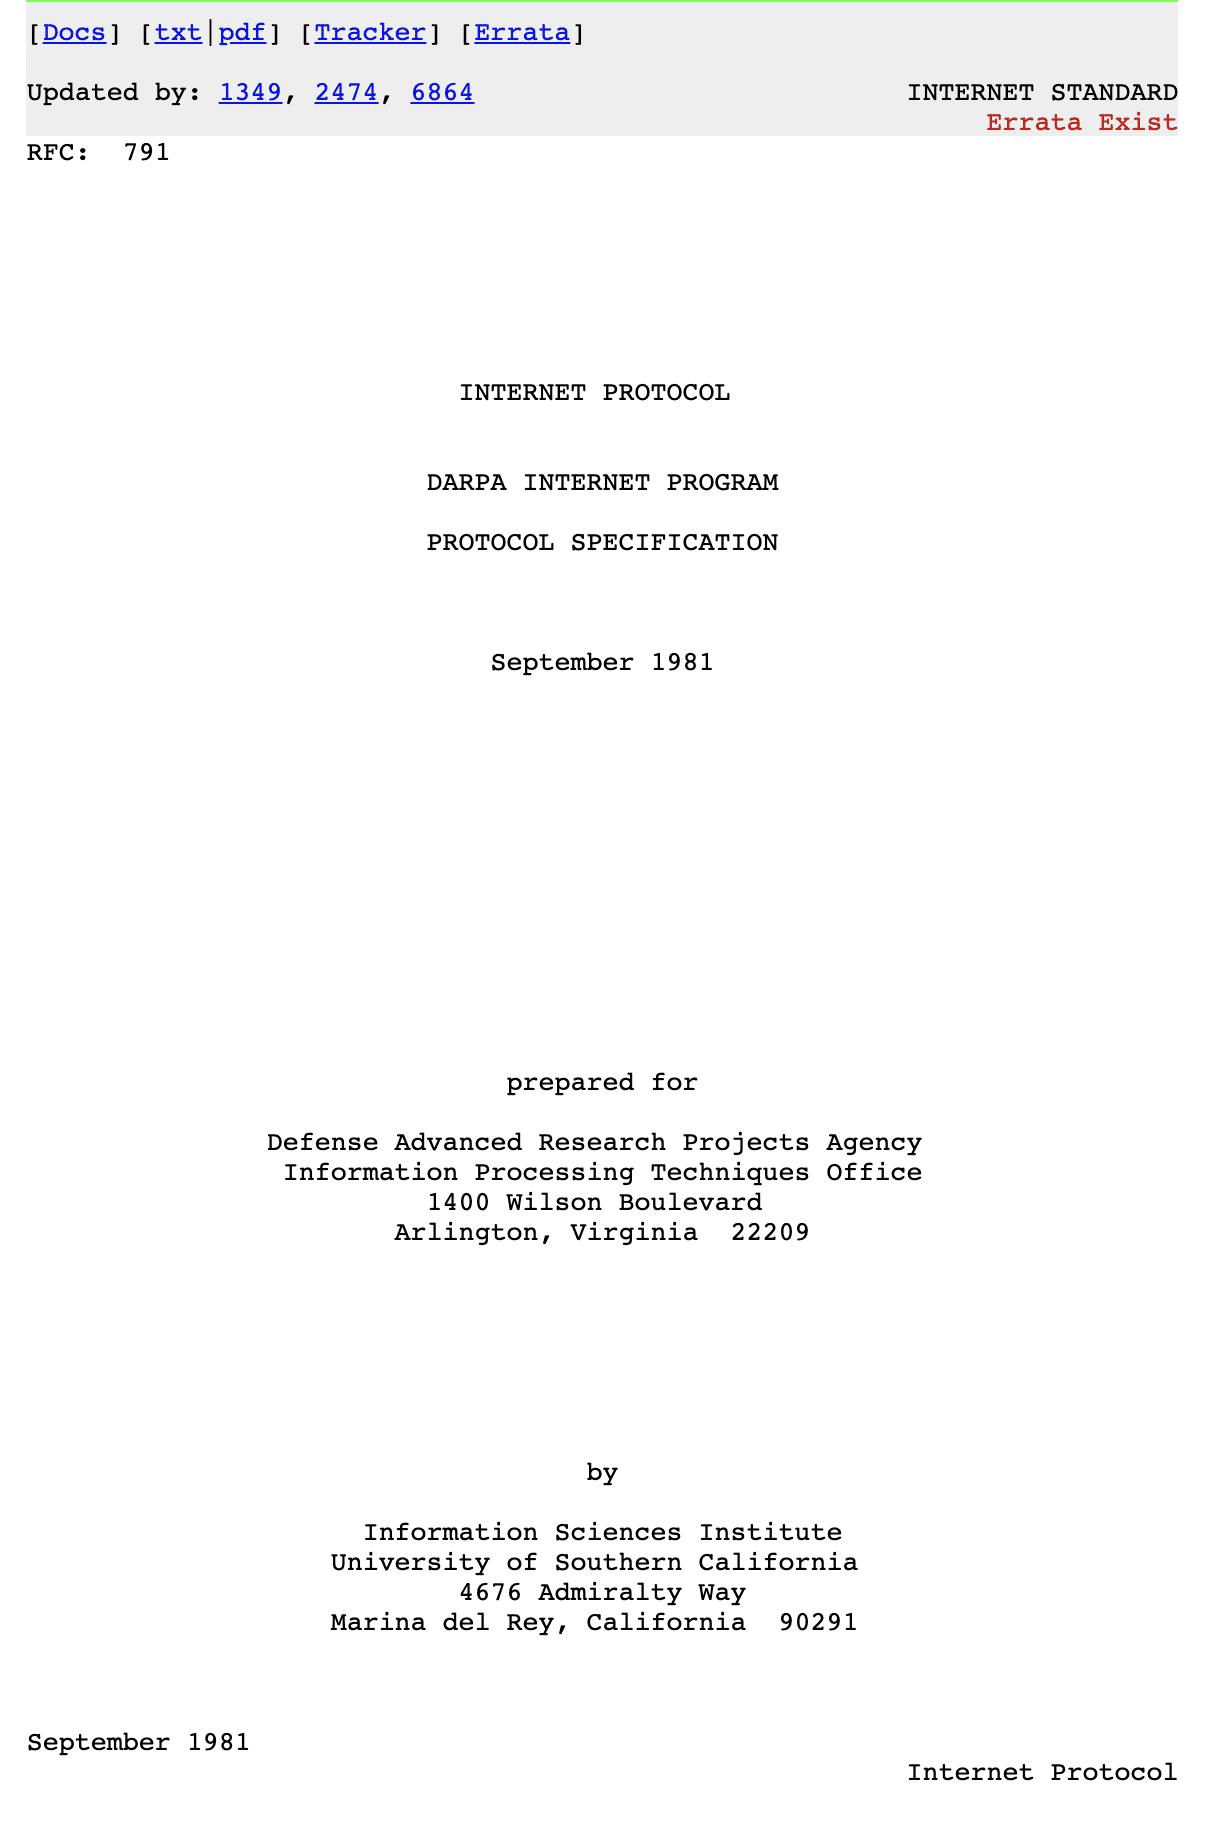 Protocolo de Internet (RFC791)